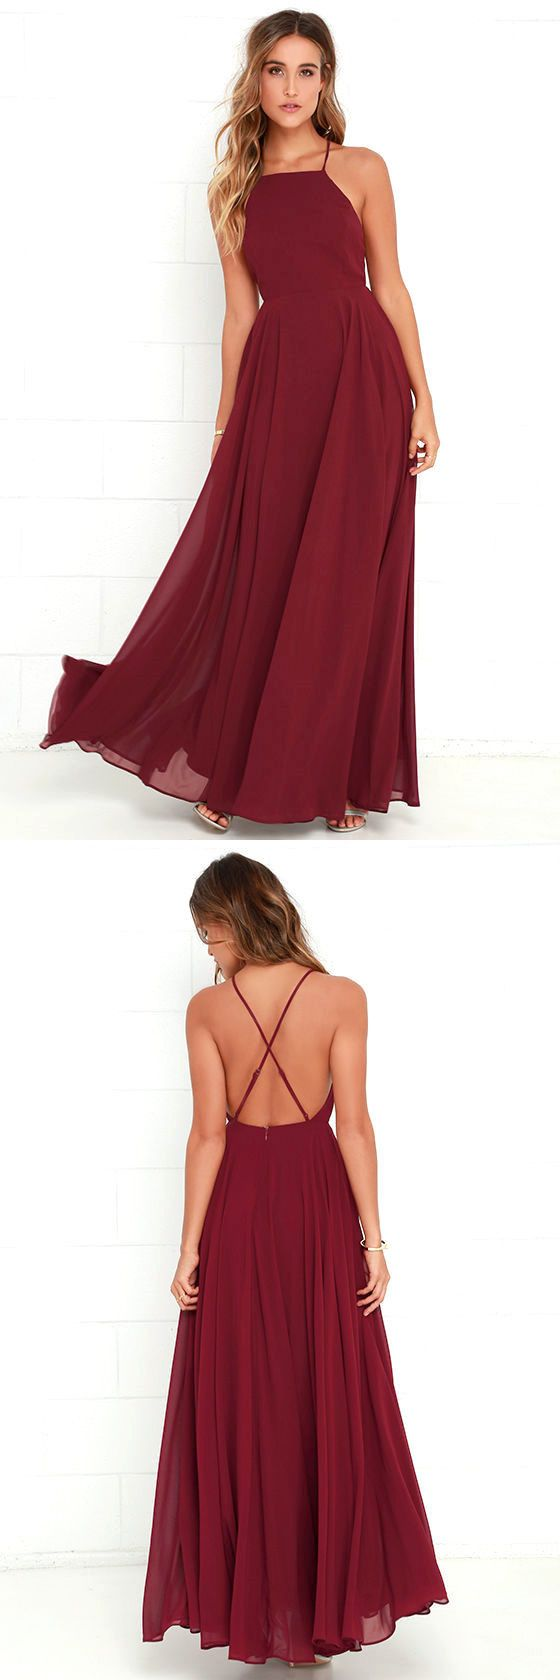 17 Best ideas about Cheap Prom Dresses on Pinterest   Long dresses ...